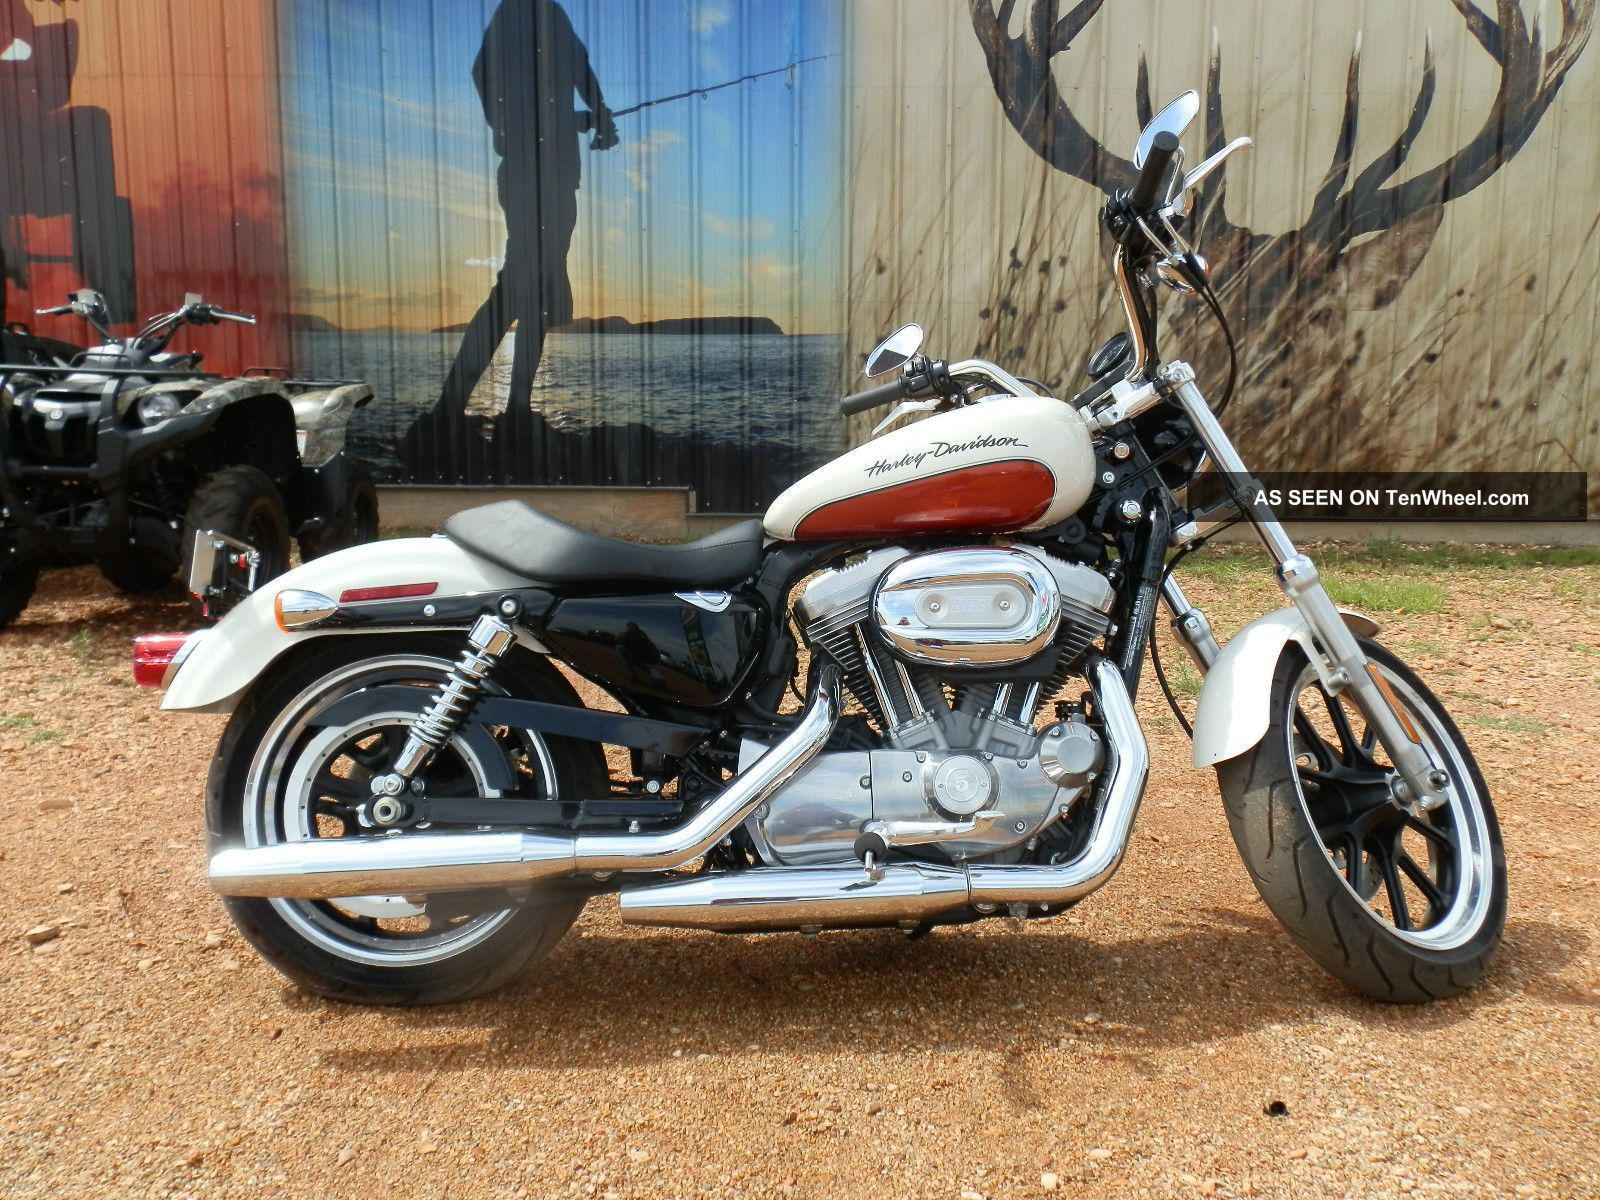 2011 Harley Davidson Sportster Xl883l